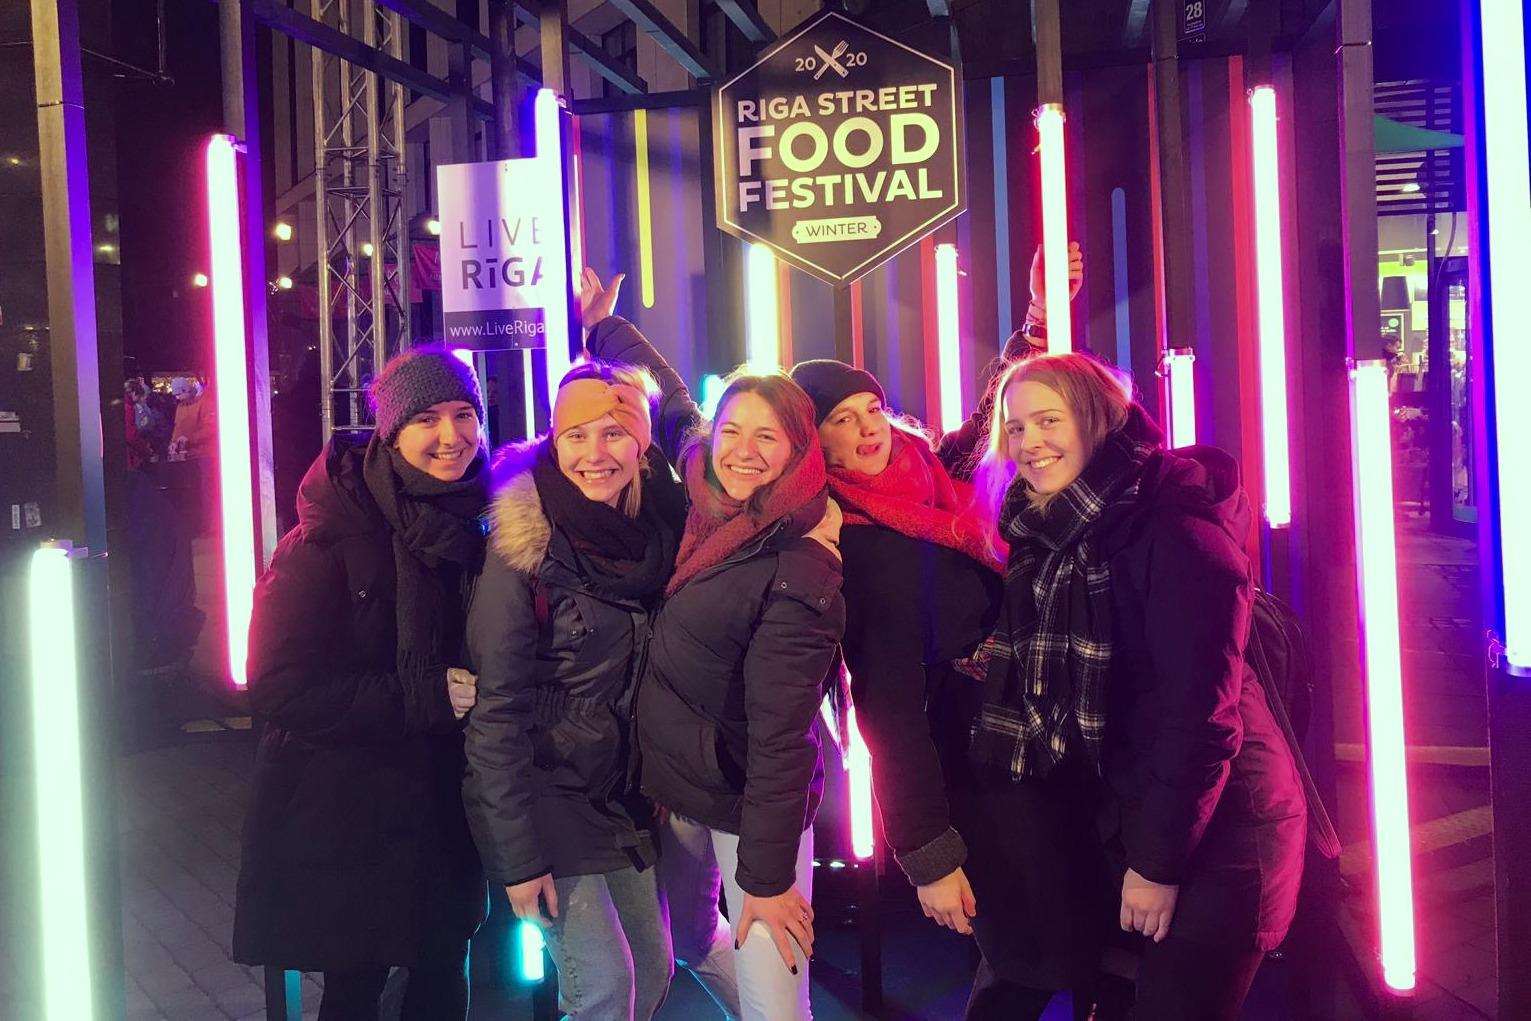 Riga Street Food Festival